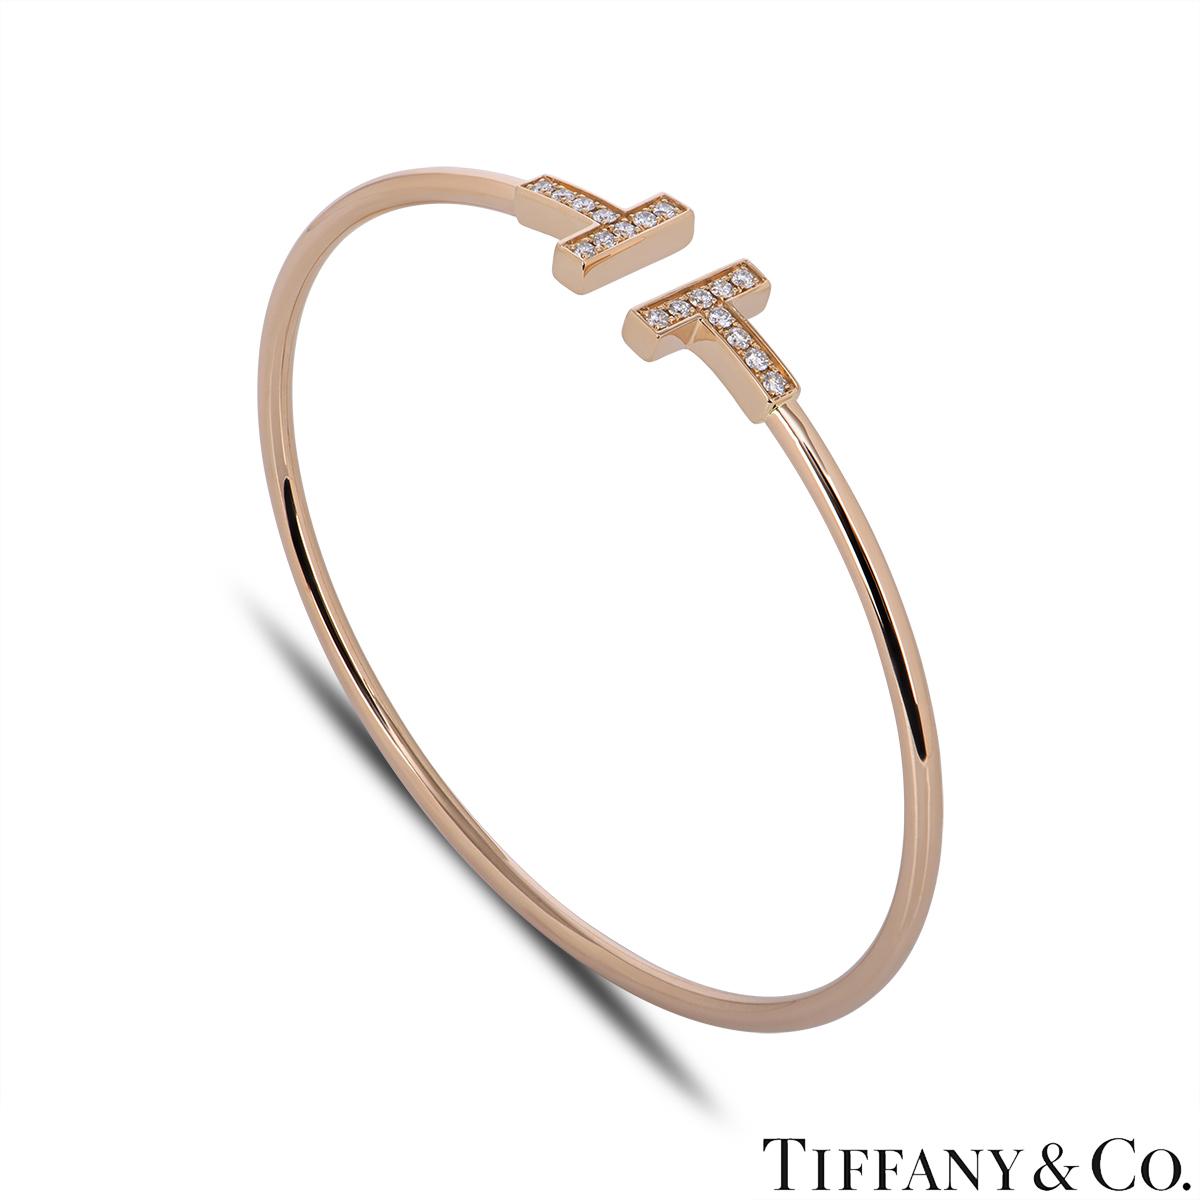 Tiffany & Co. Rose Gold Tiffany T Diamond Bracelet